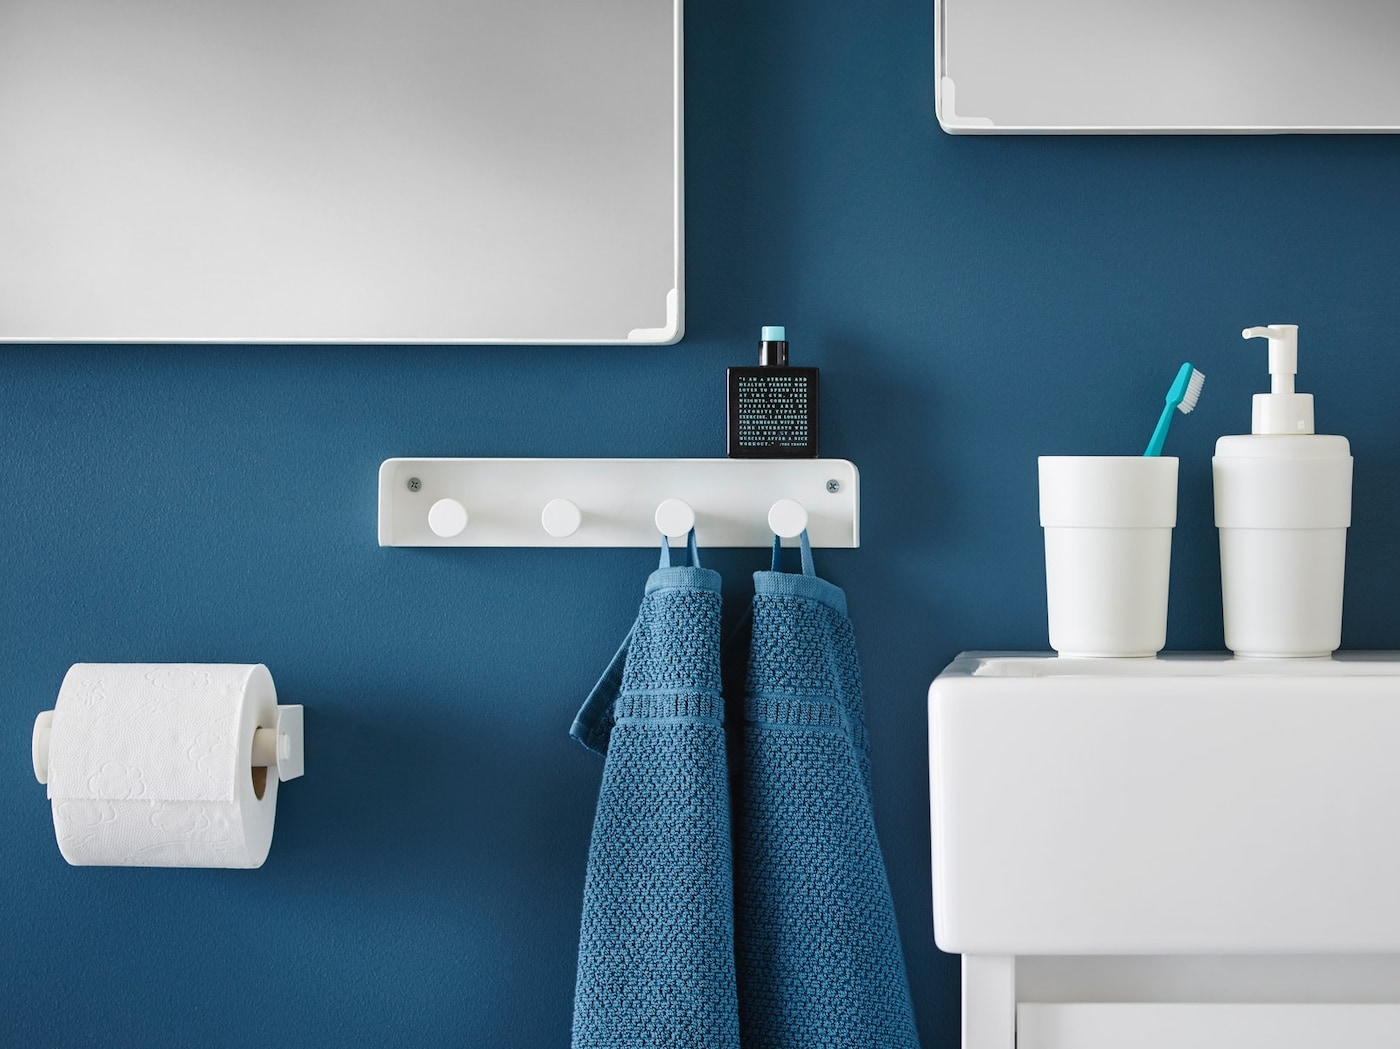 ENUDDEN bathroom series